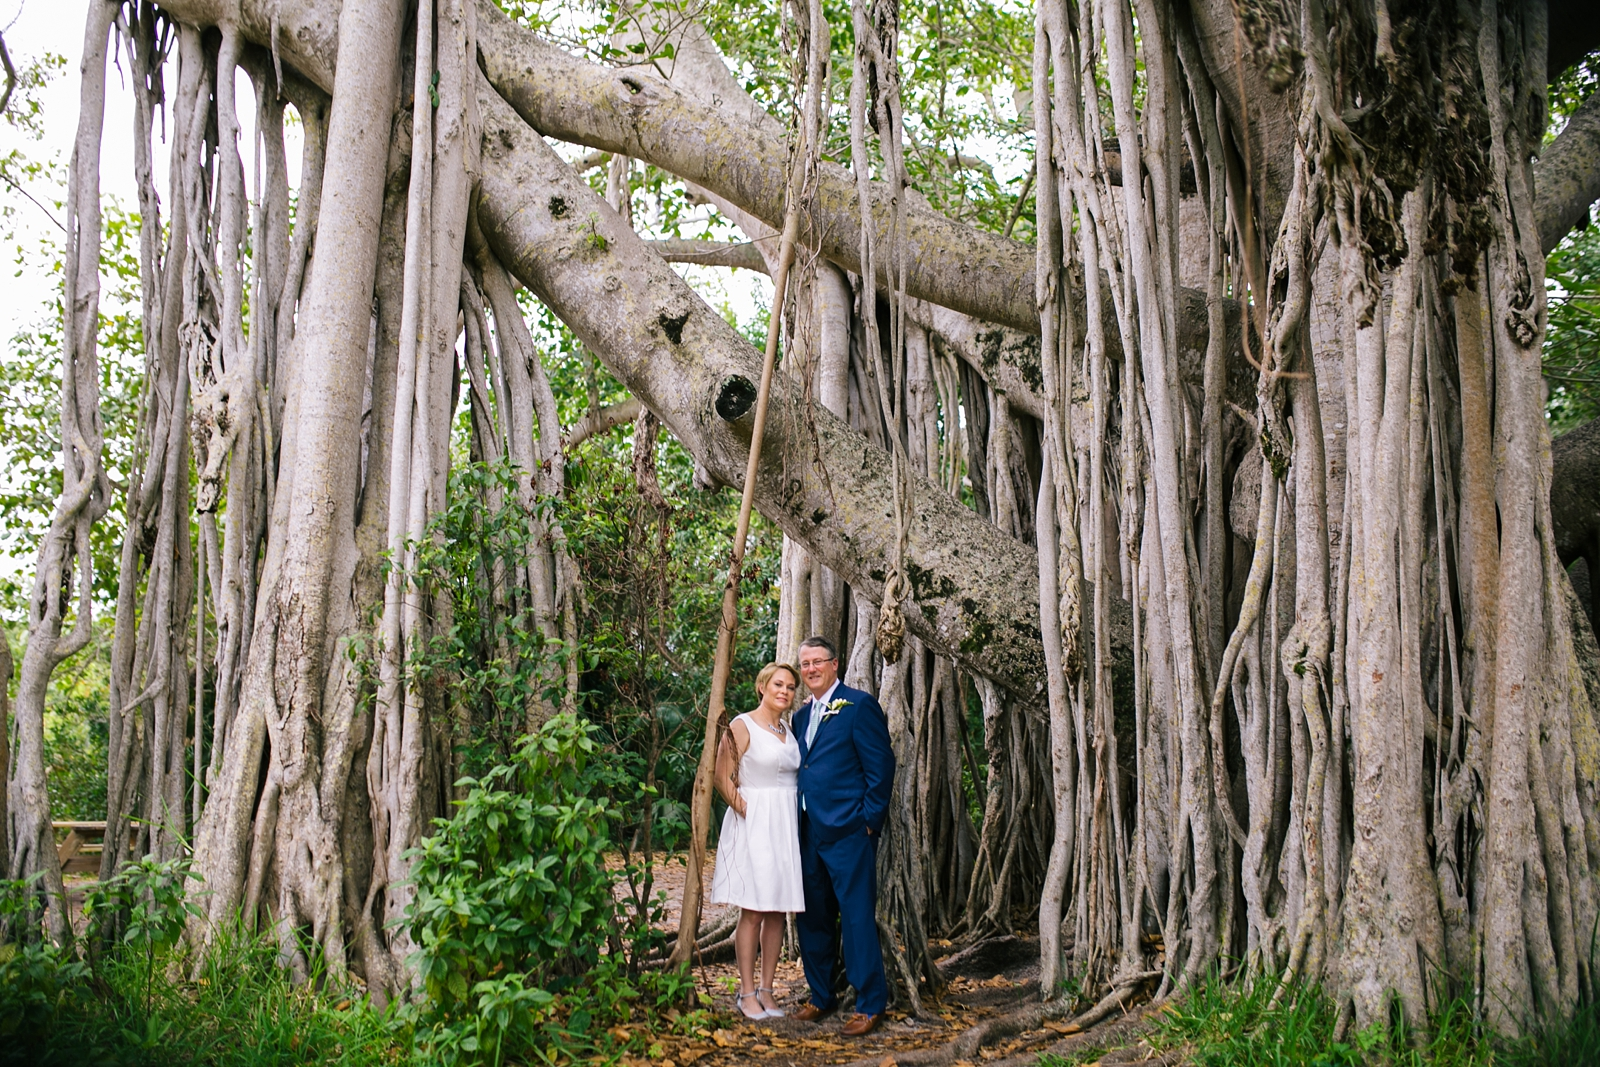 18-los-angeles-wedding-photographer-fort-lauderdale.jpg